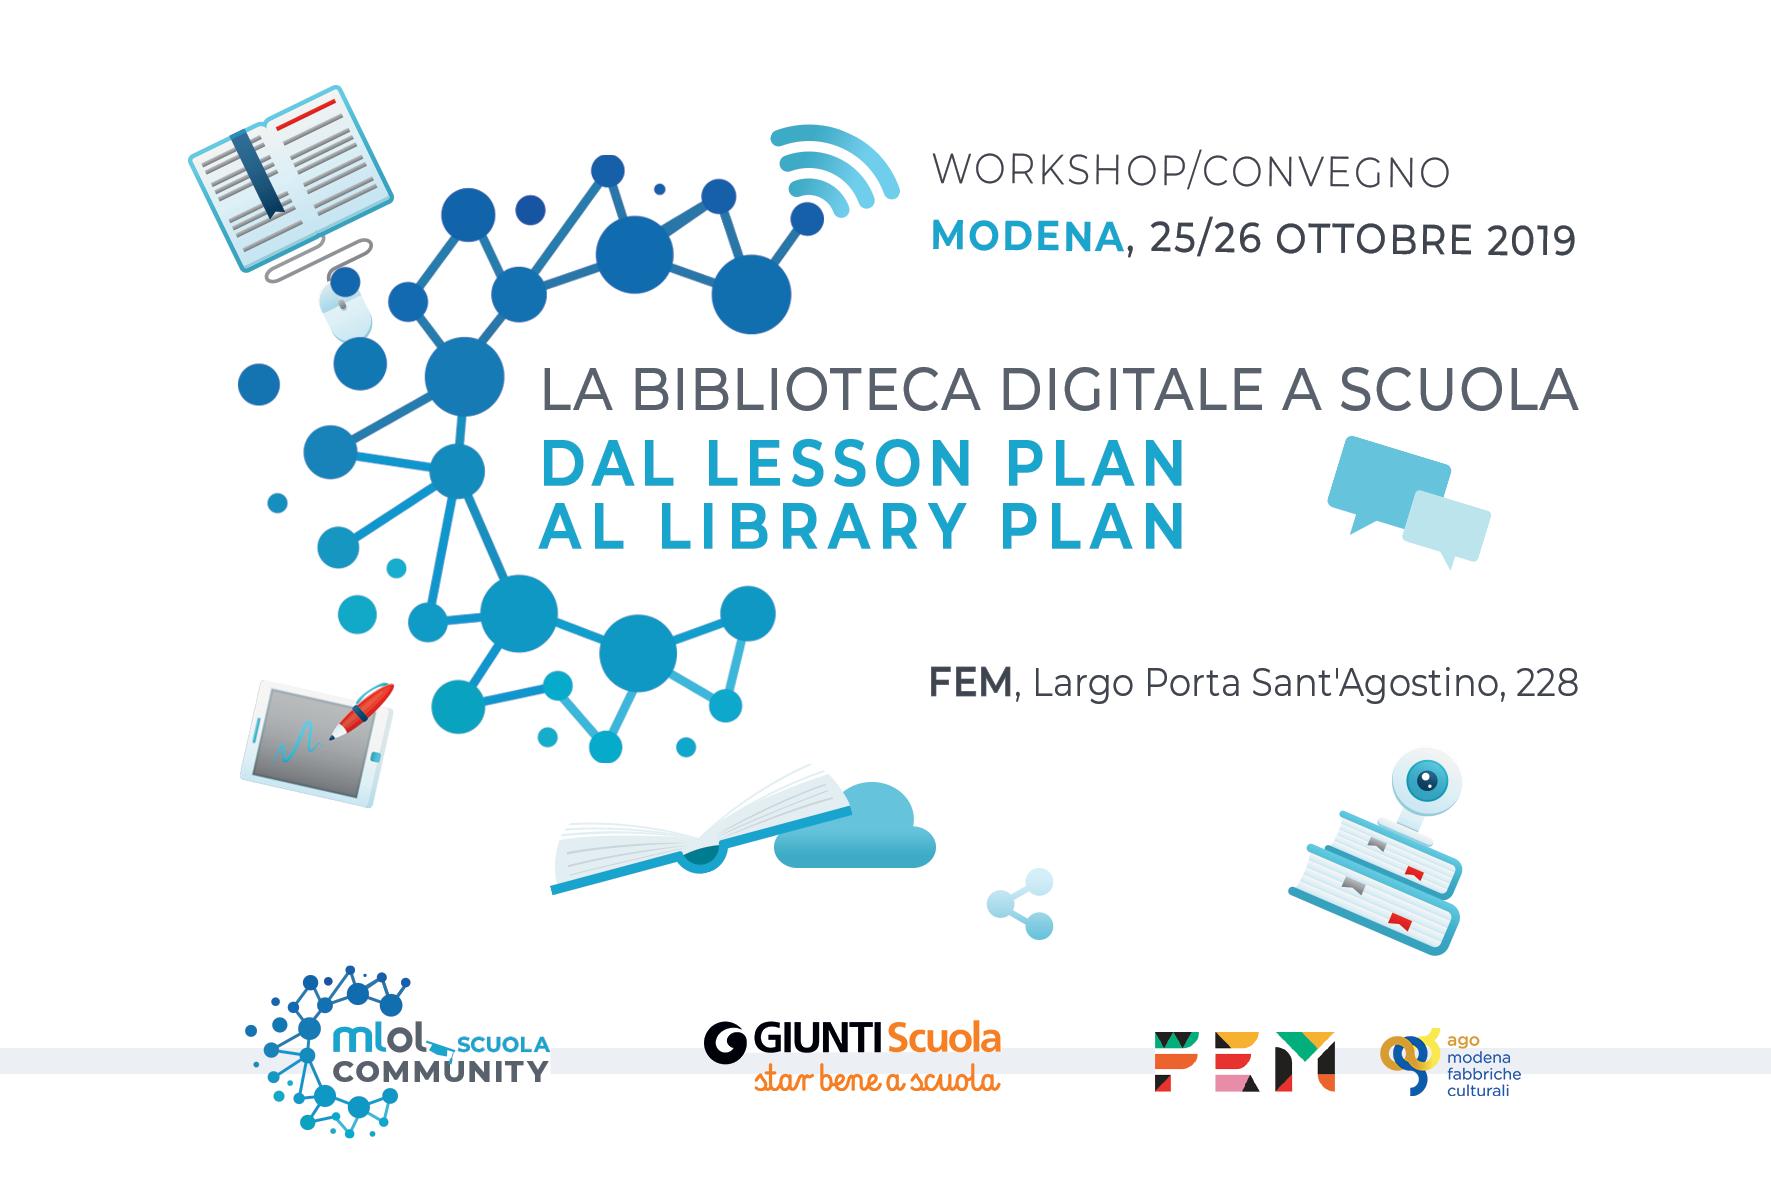 La biblioteca digitale a scuola